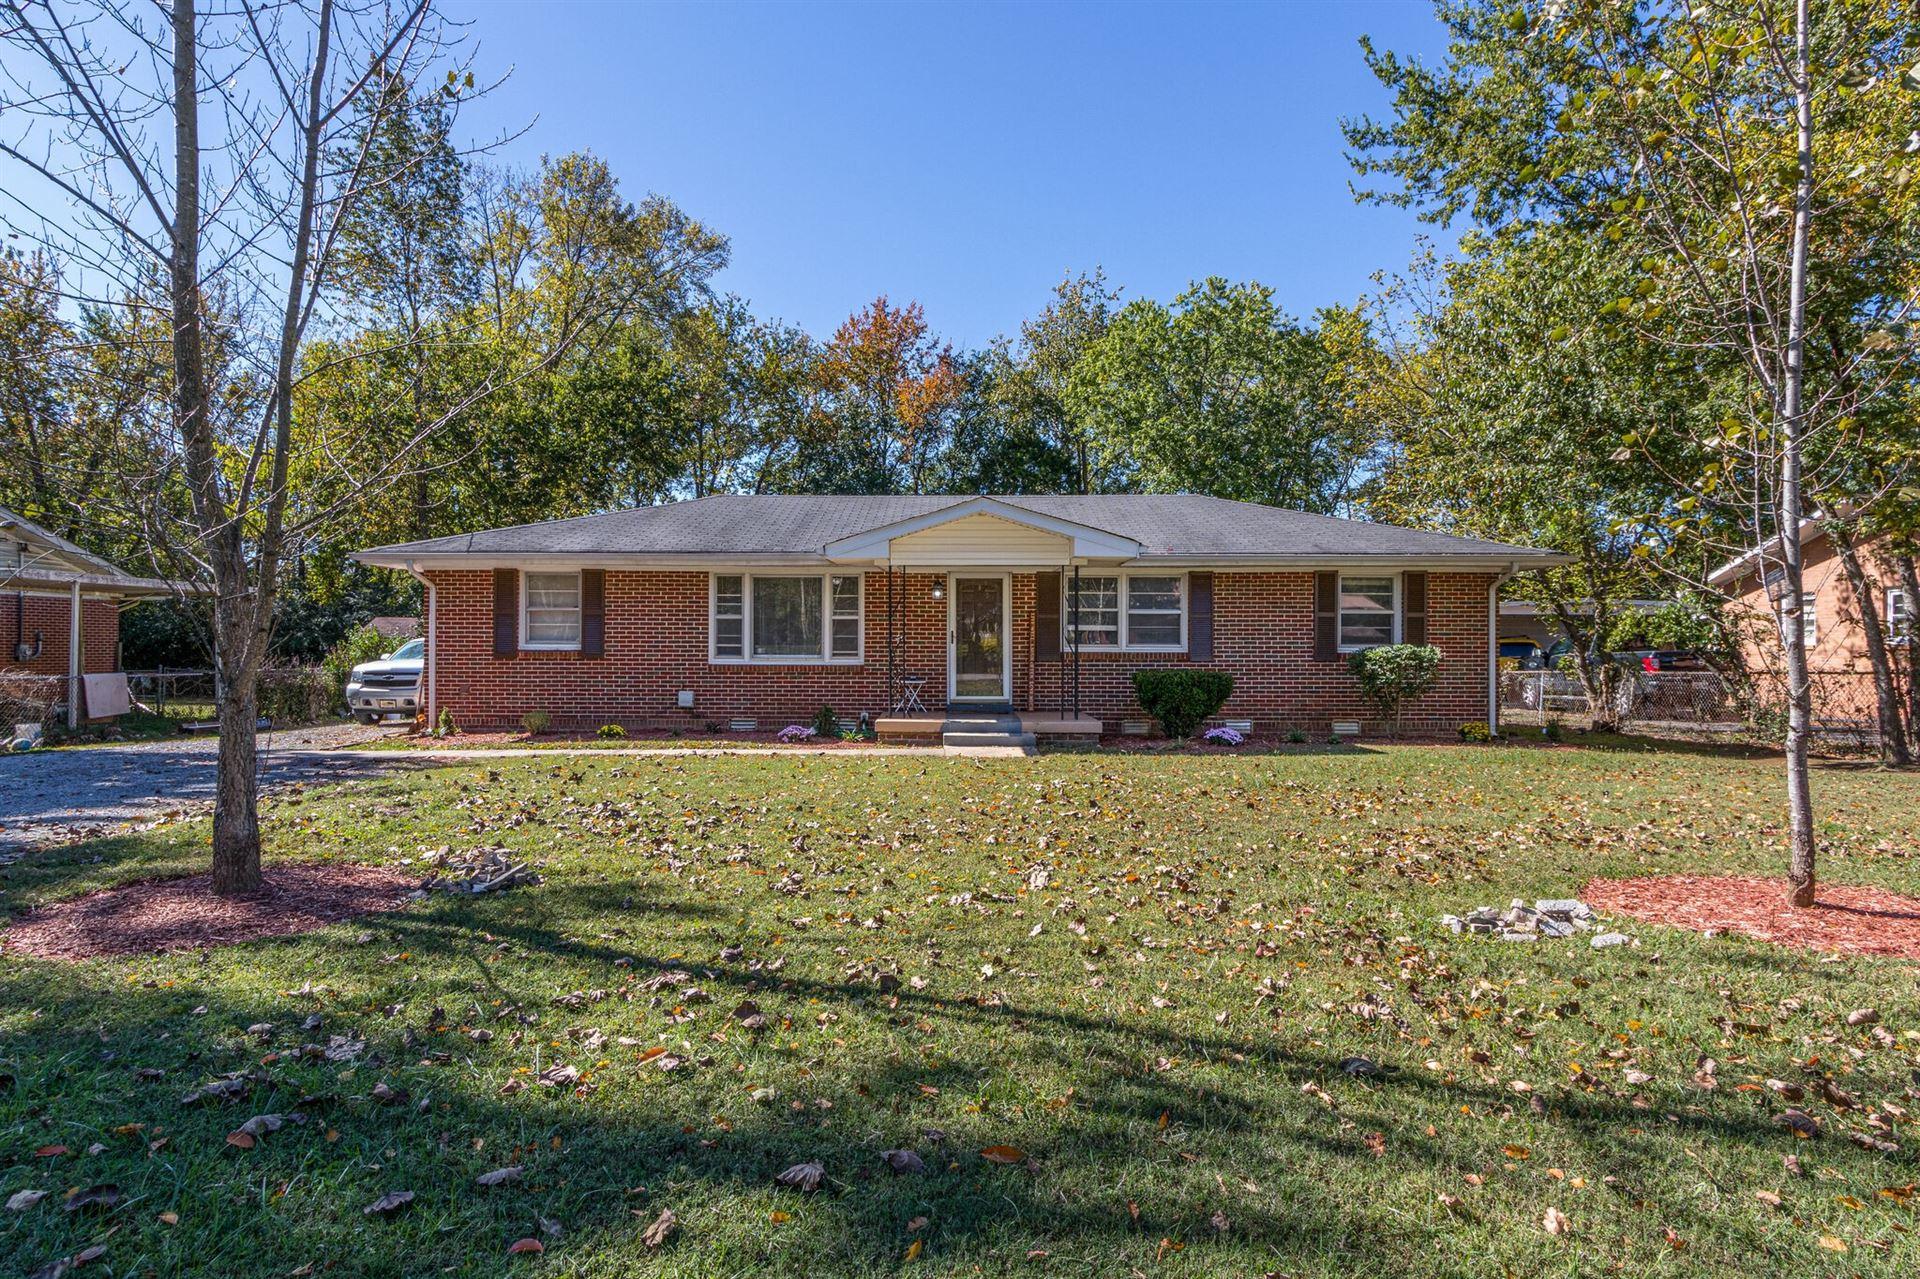 910 S Baird Ln, Murfreesboro, TN 37130 - MLS#: 2194882